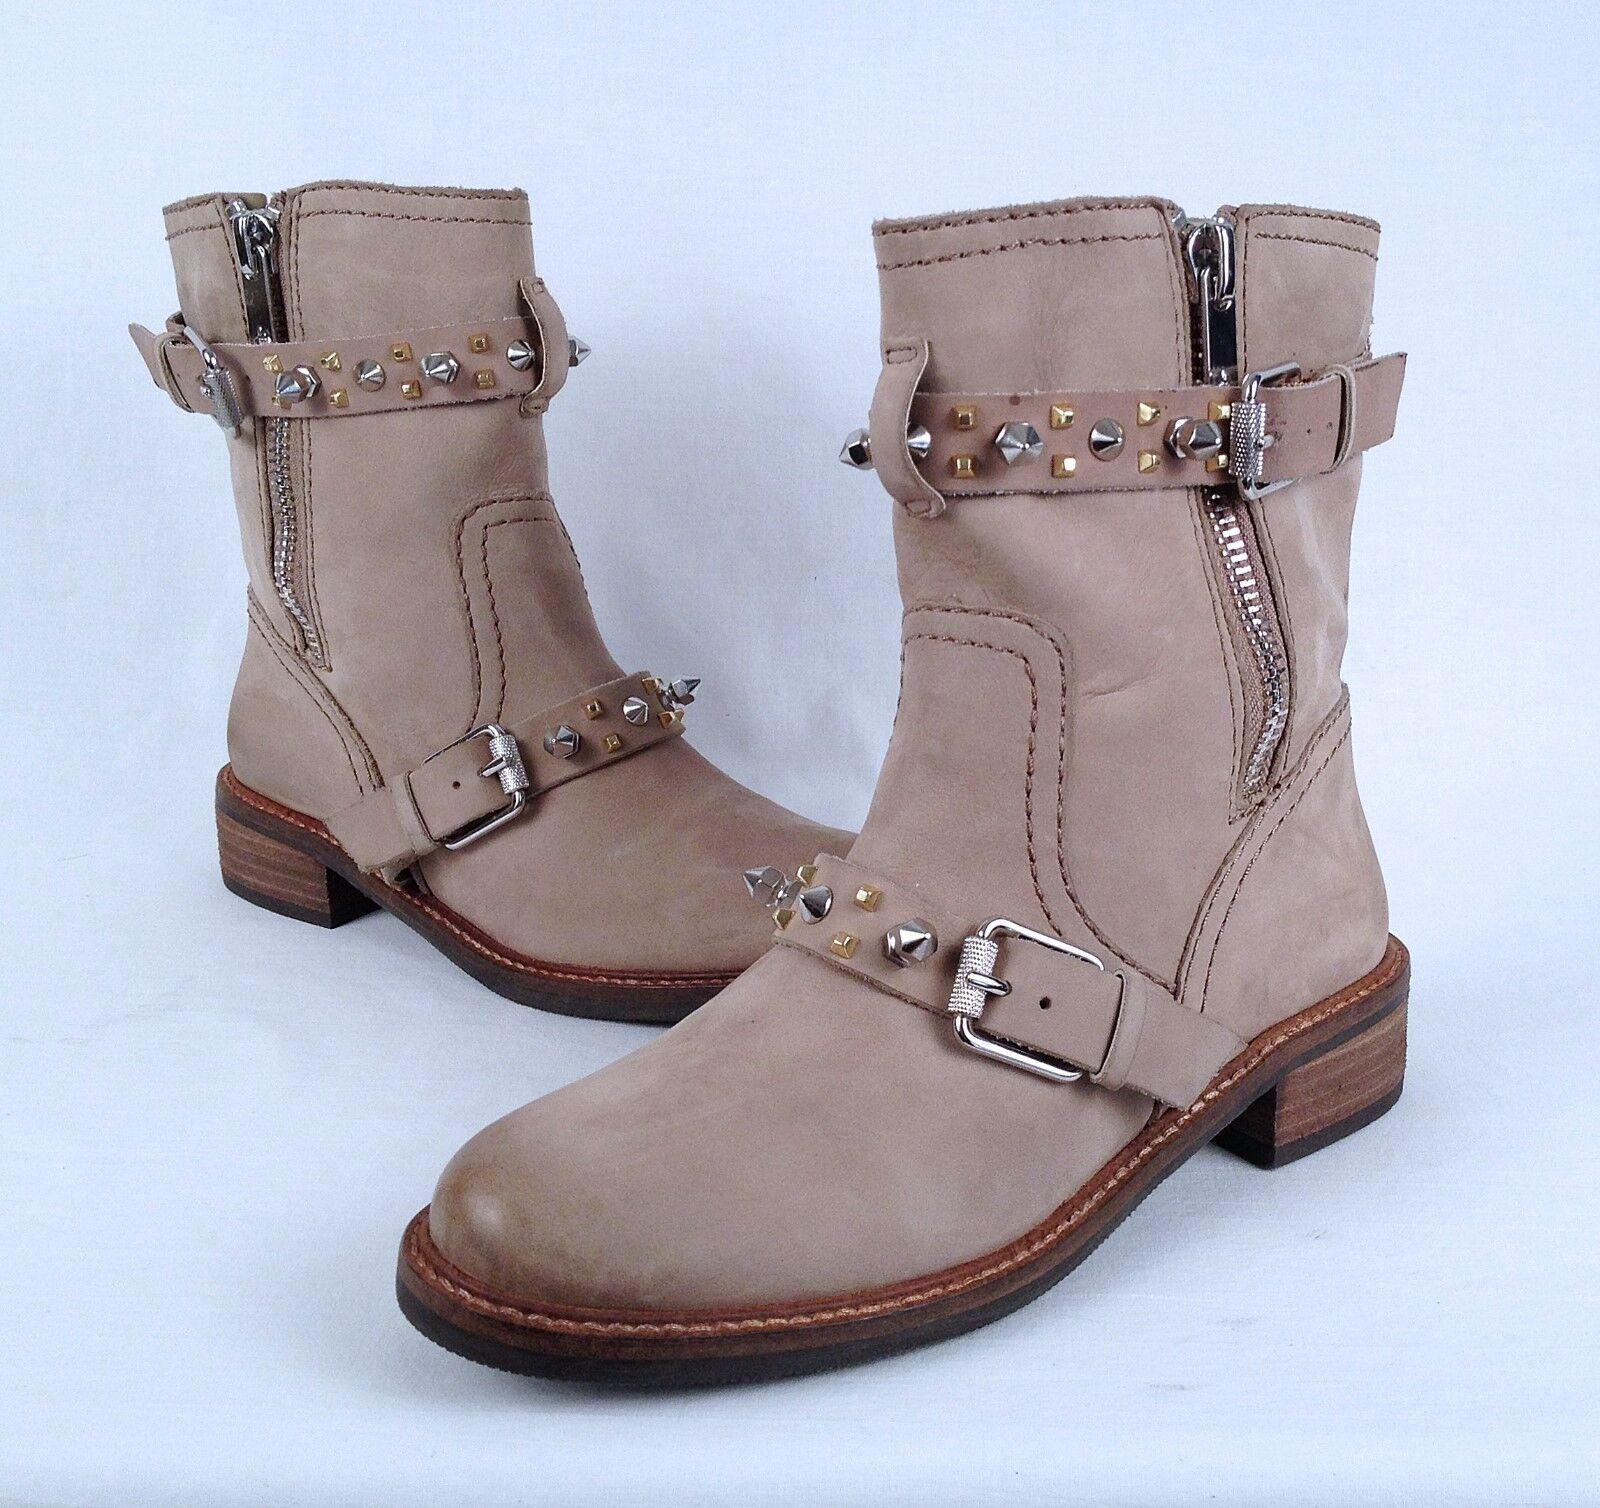 Sam Edelman 'Adele' Moto Boot- Sand- Größe 7 M  (B58)